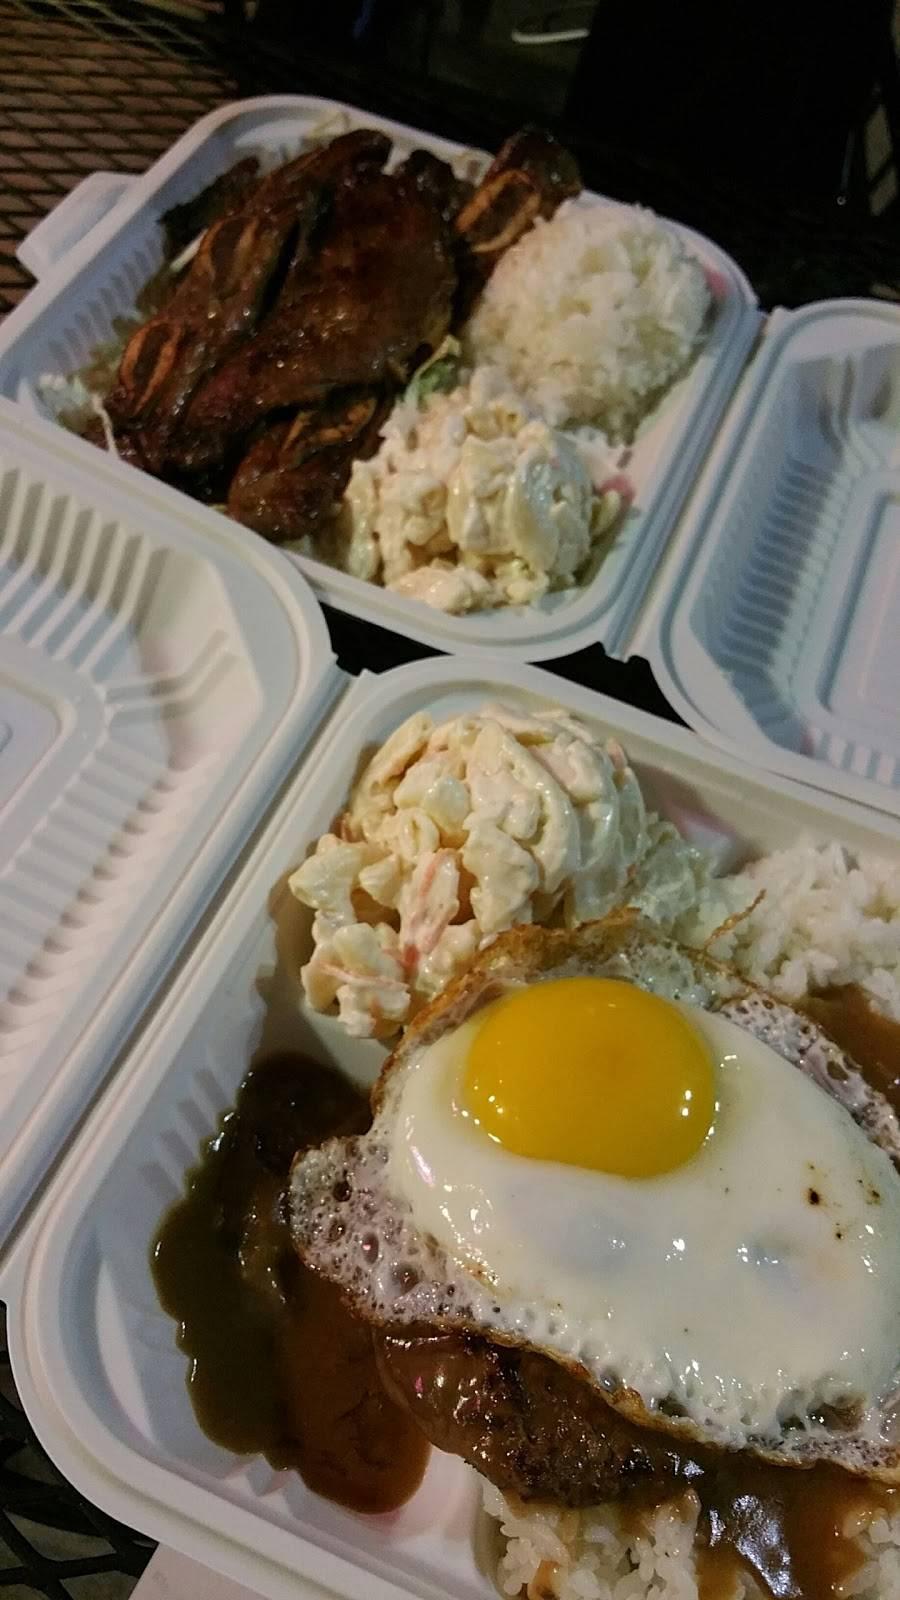 L & L Hawaiian Barbecue - MB   restaurant   340 Adrian Rd, Millbrae, CA 94030, USA   6502598063 OR +1 650-259-8063